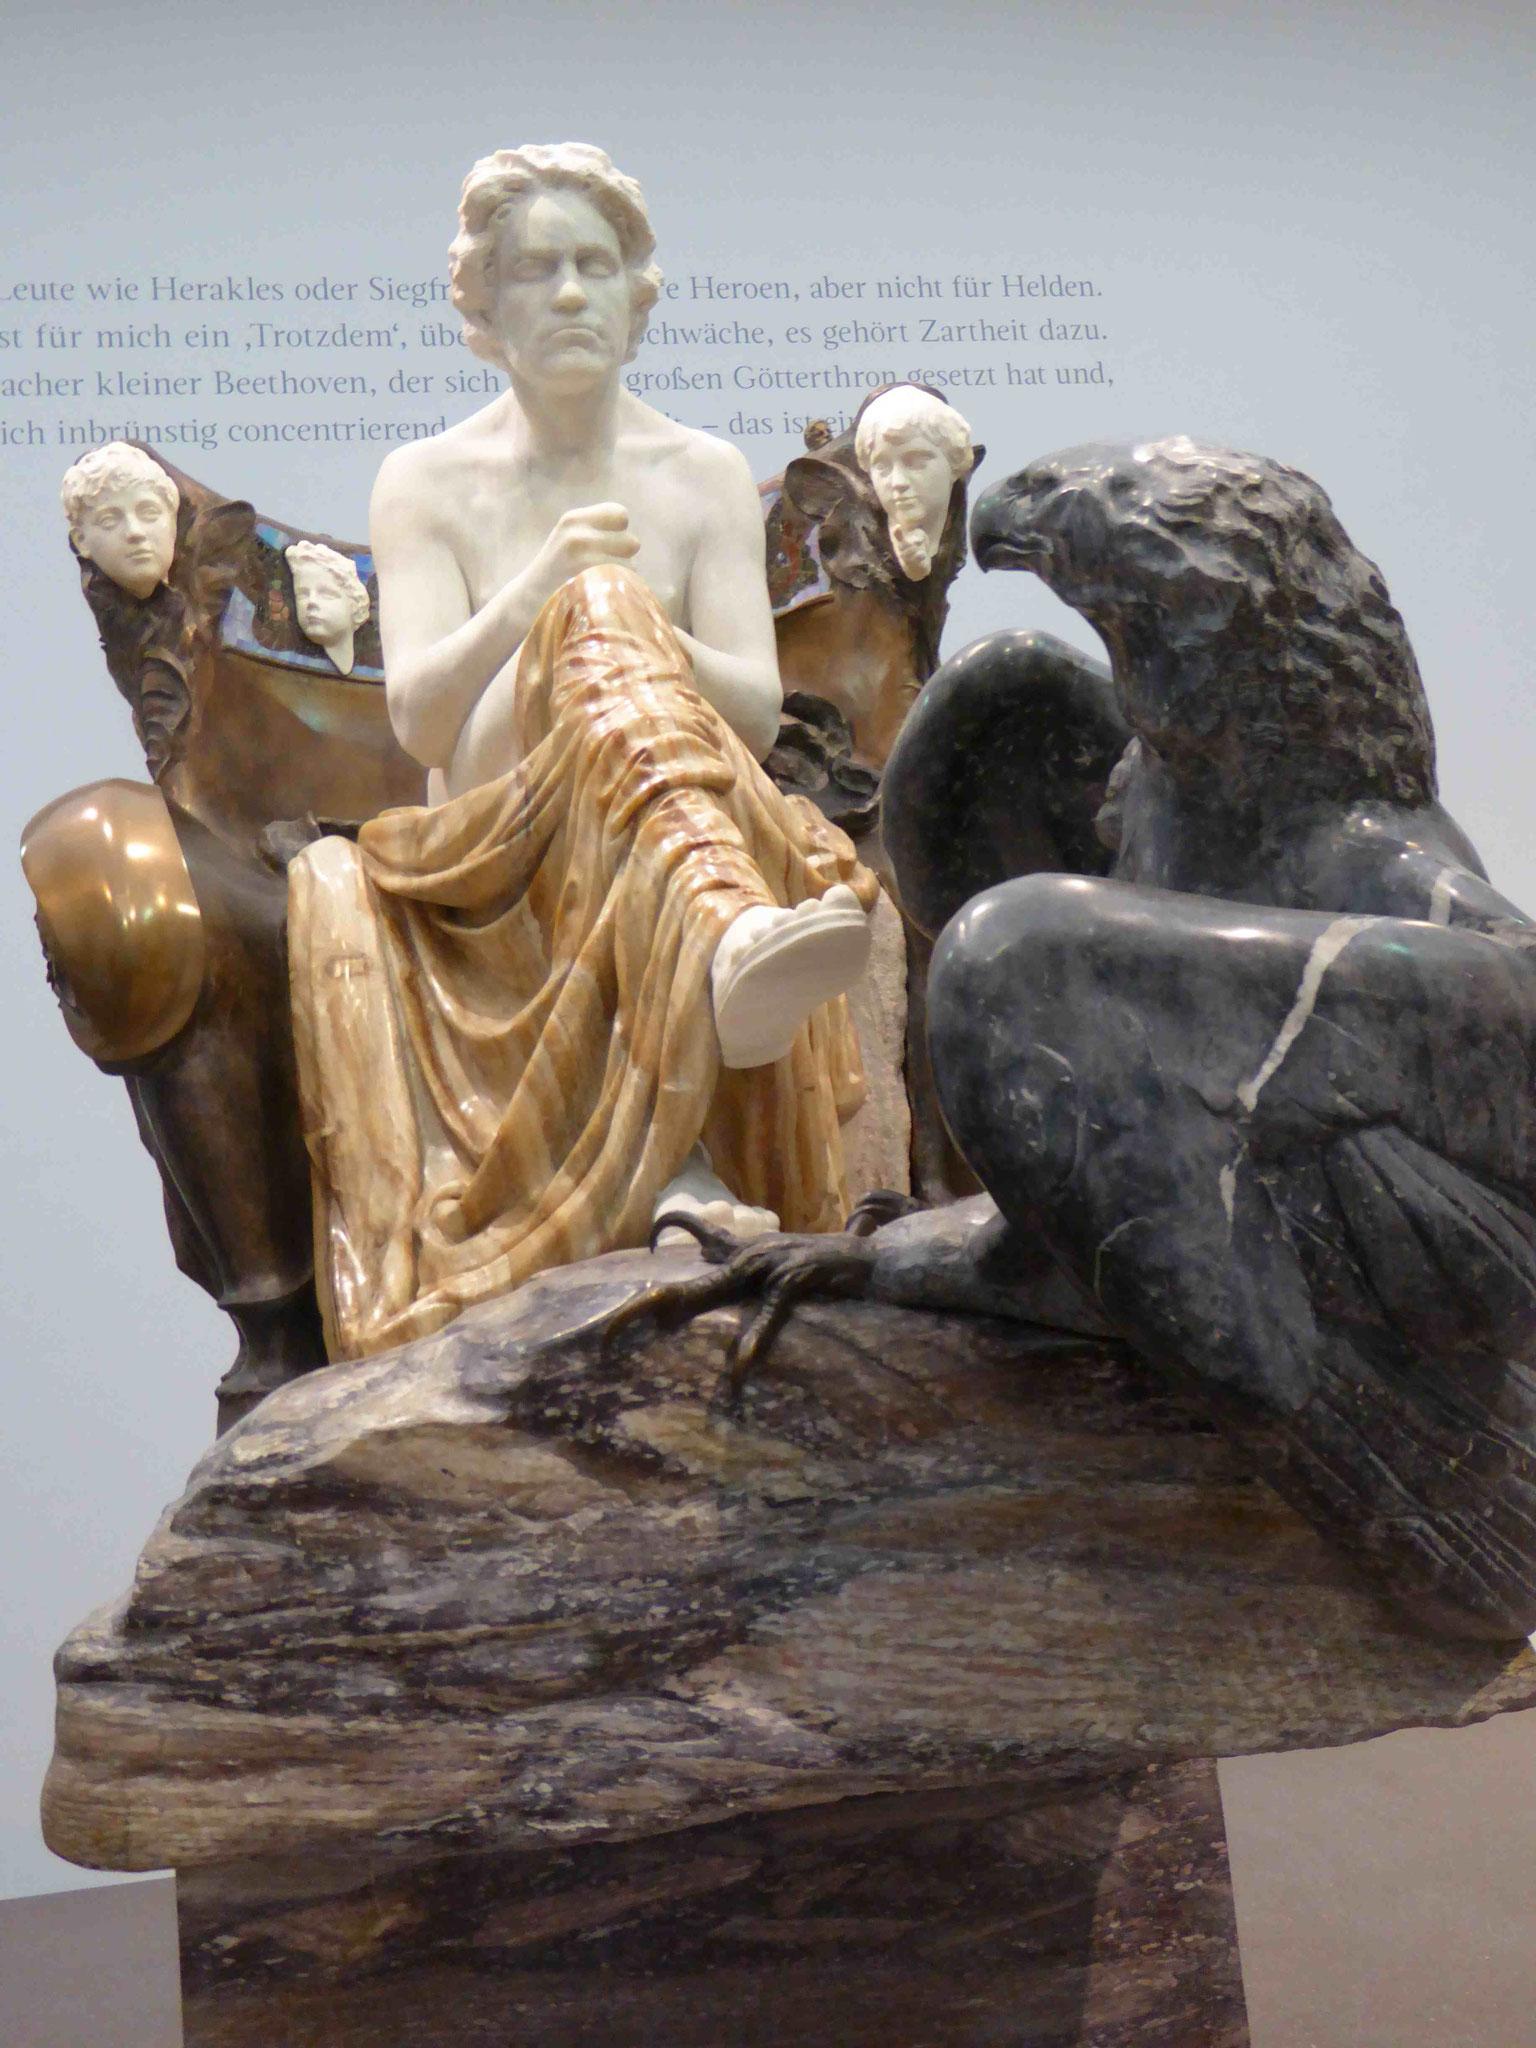 Max Klinger, Beethoven-Denkmal, Museum der Bildenden Künste, Leipzig